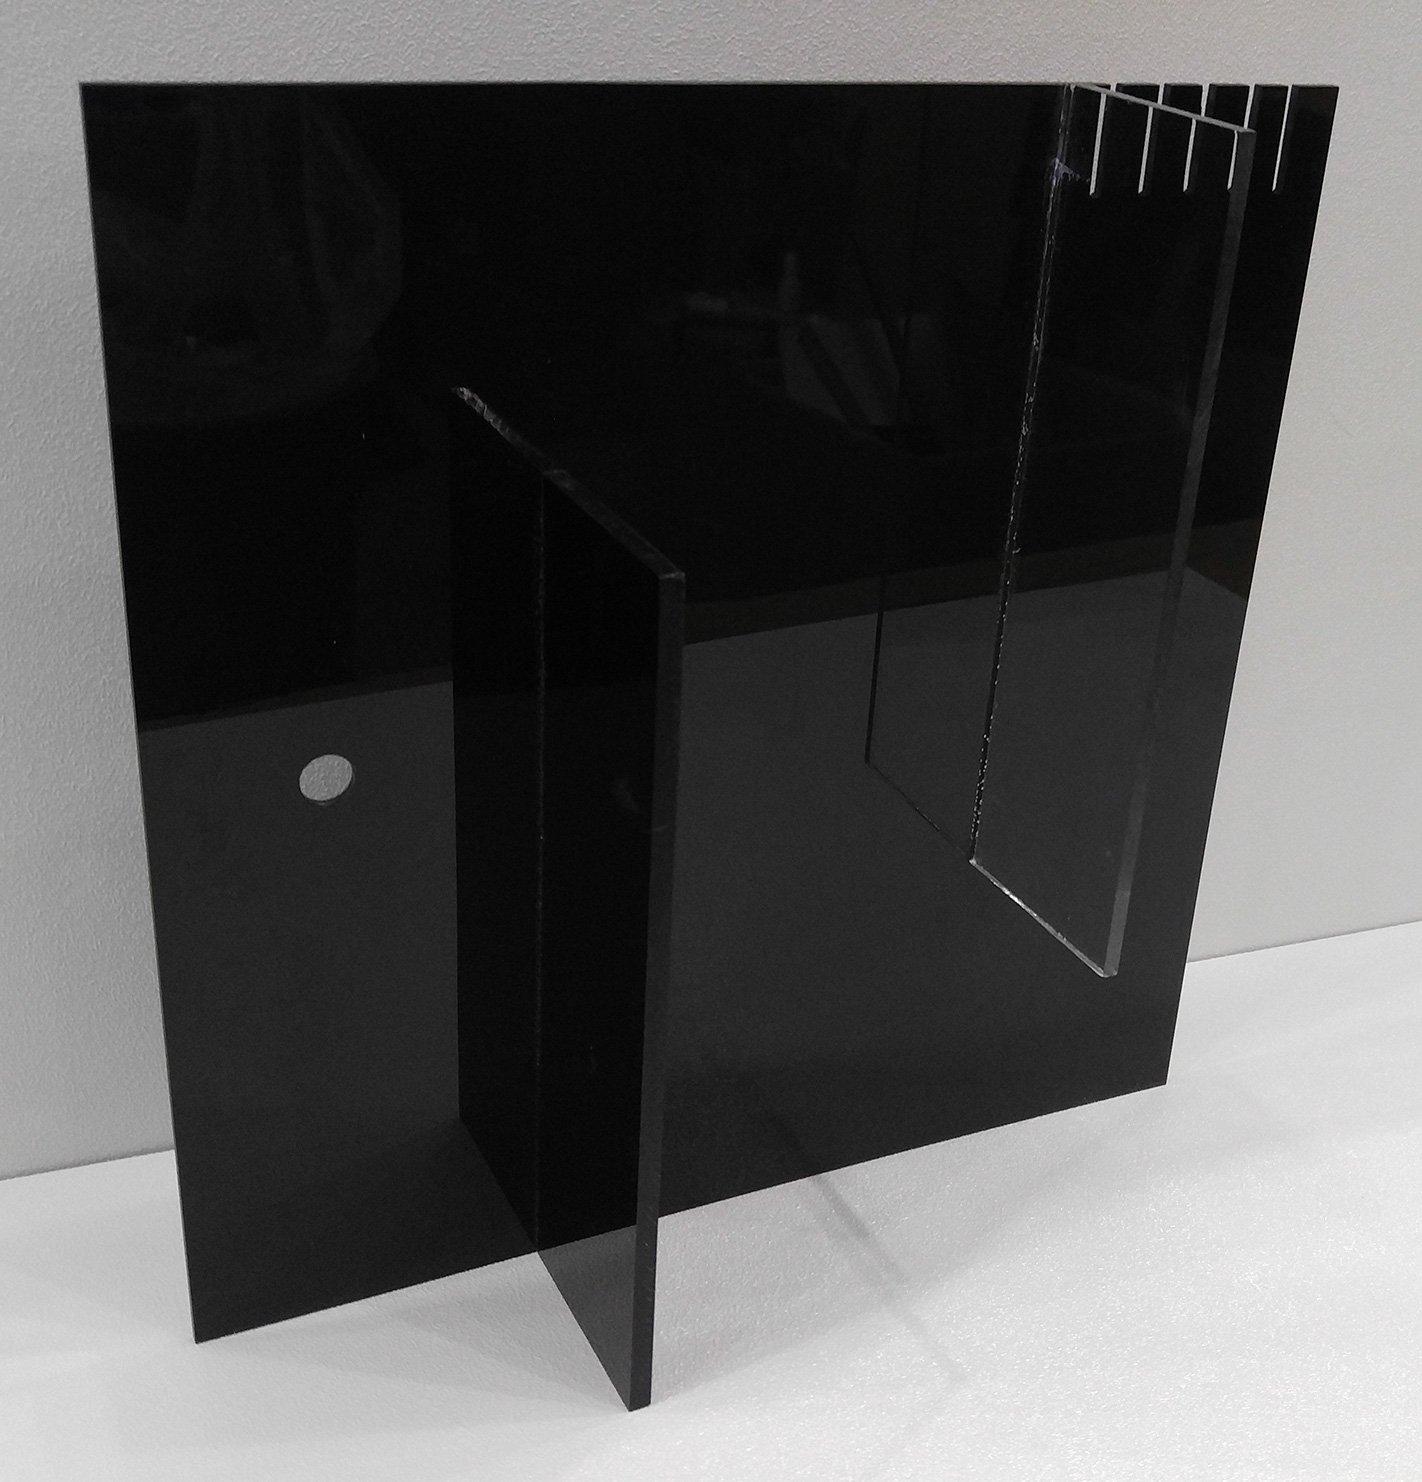 Drop In Diy Acrylic Cube Hidden Sump Filter For 12x12 Cube